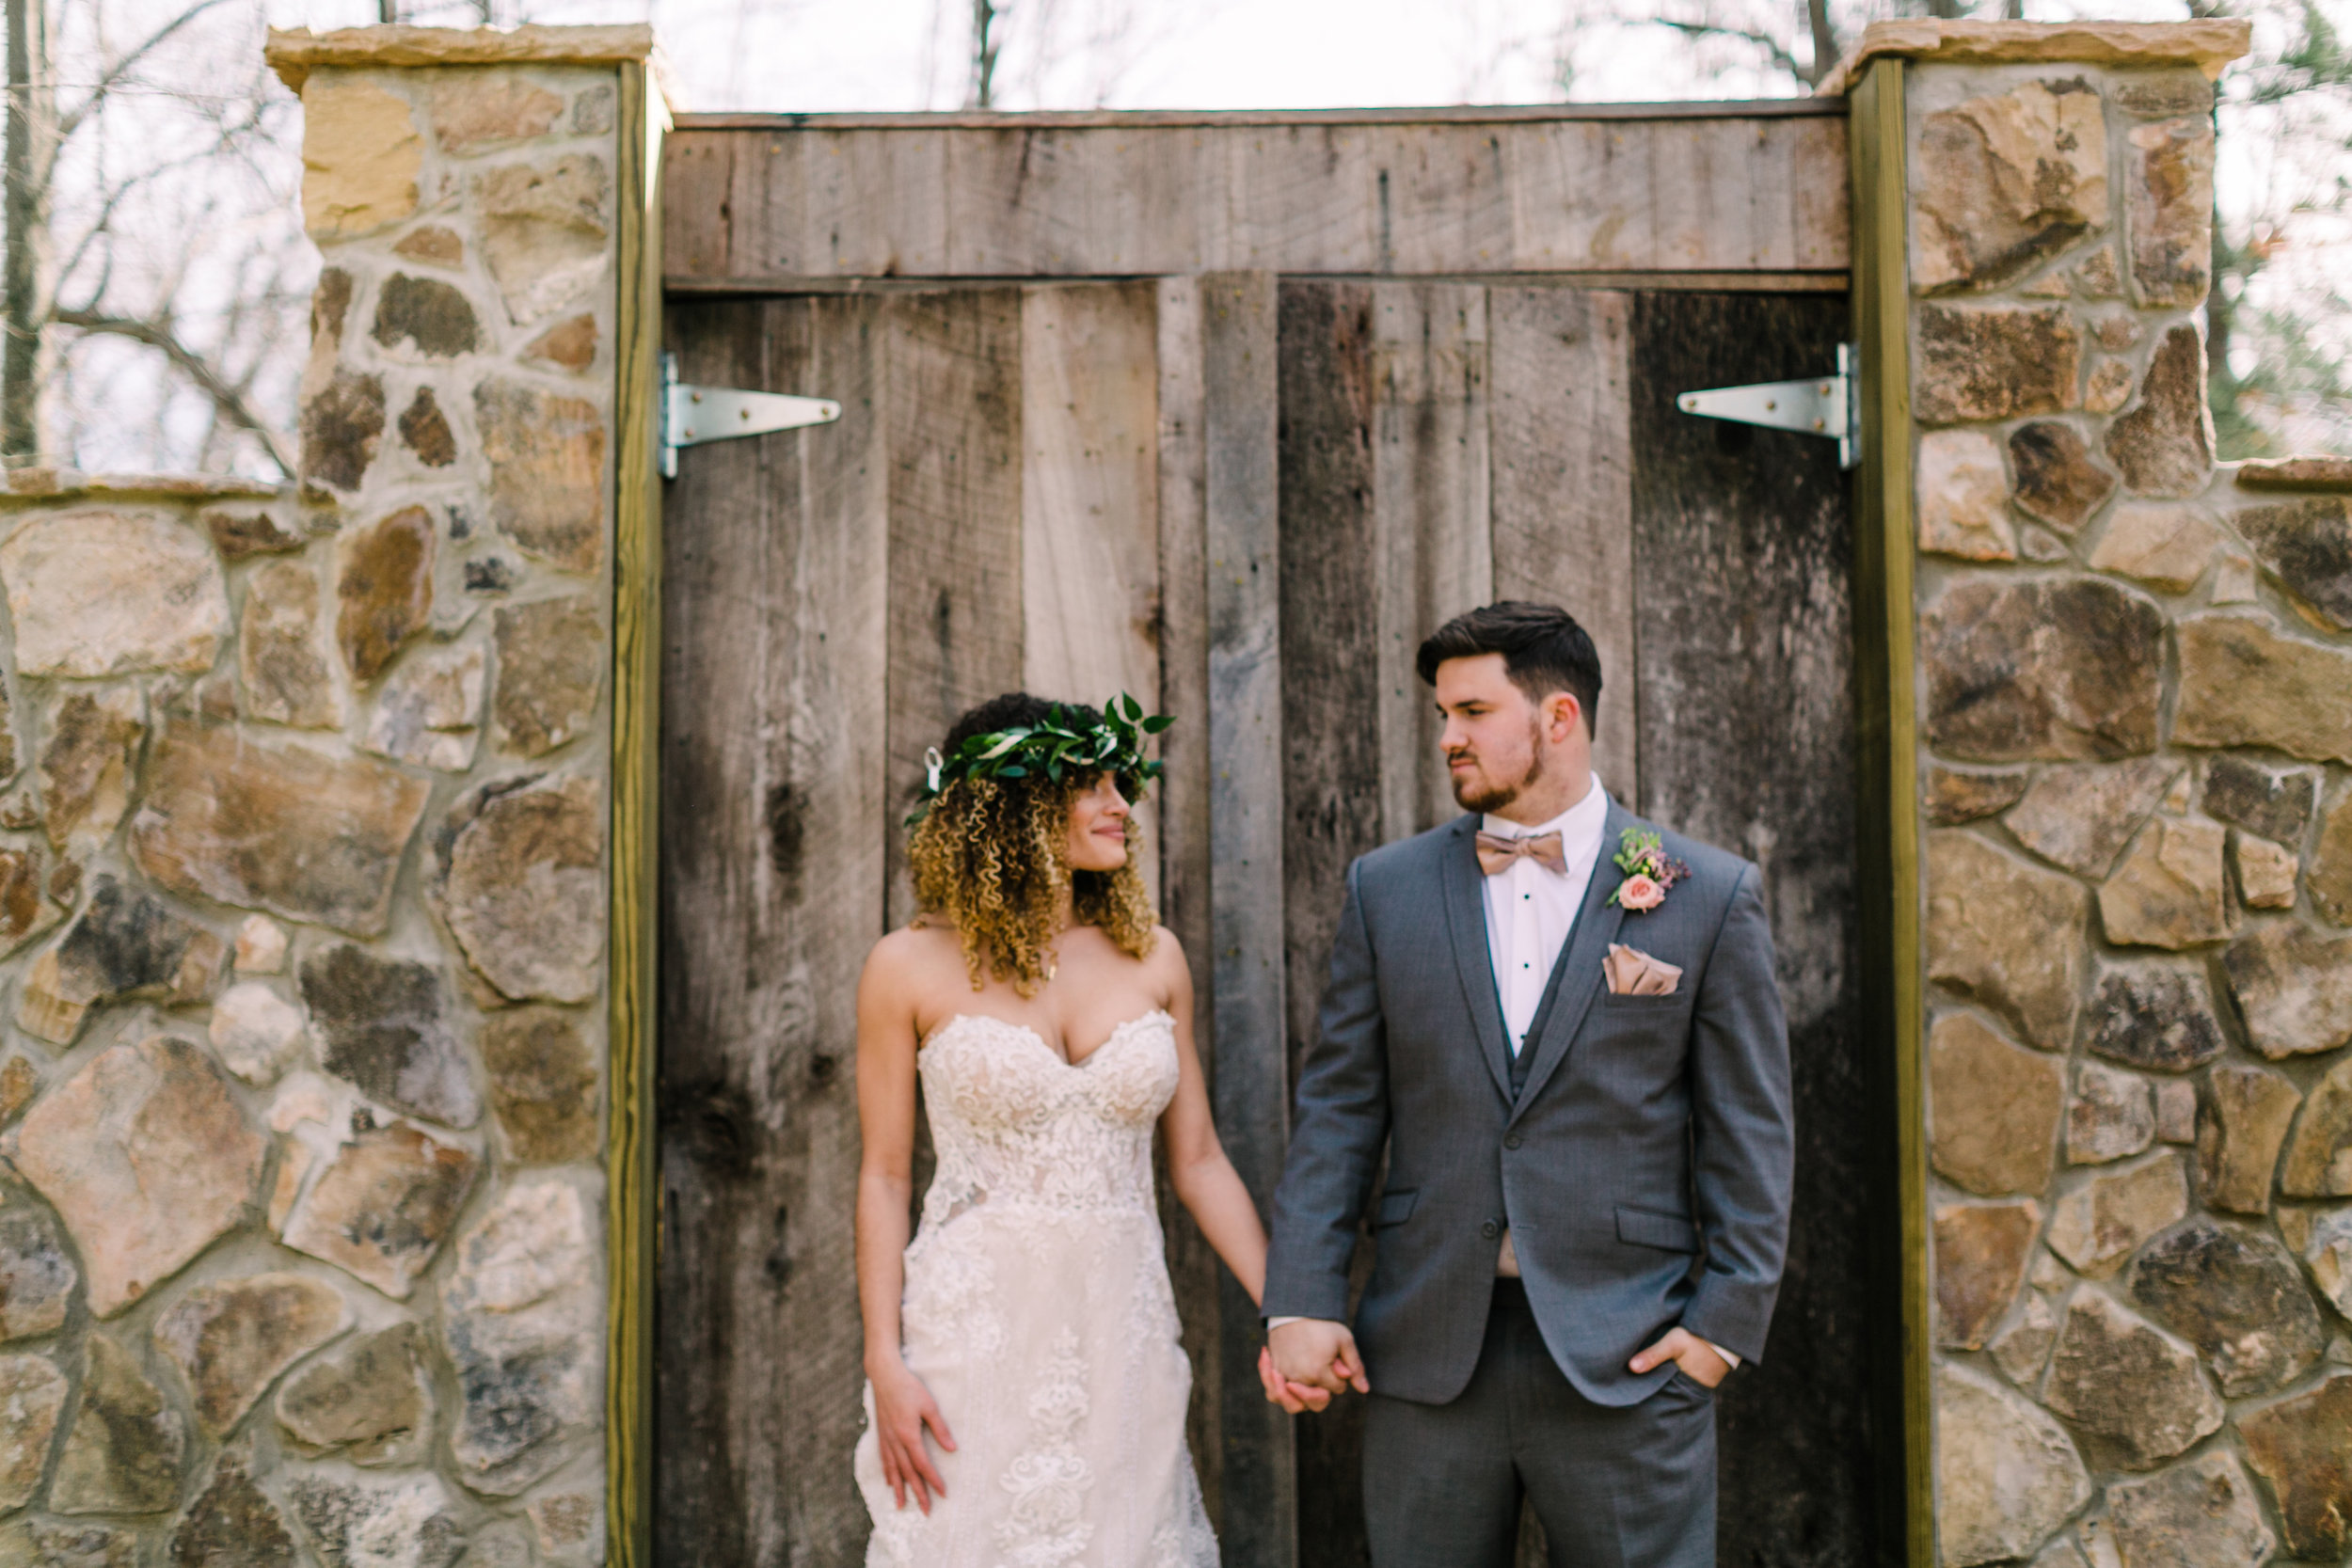 romantic+valentines+day+wedding+horses+chapel (3 of 11).jpg